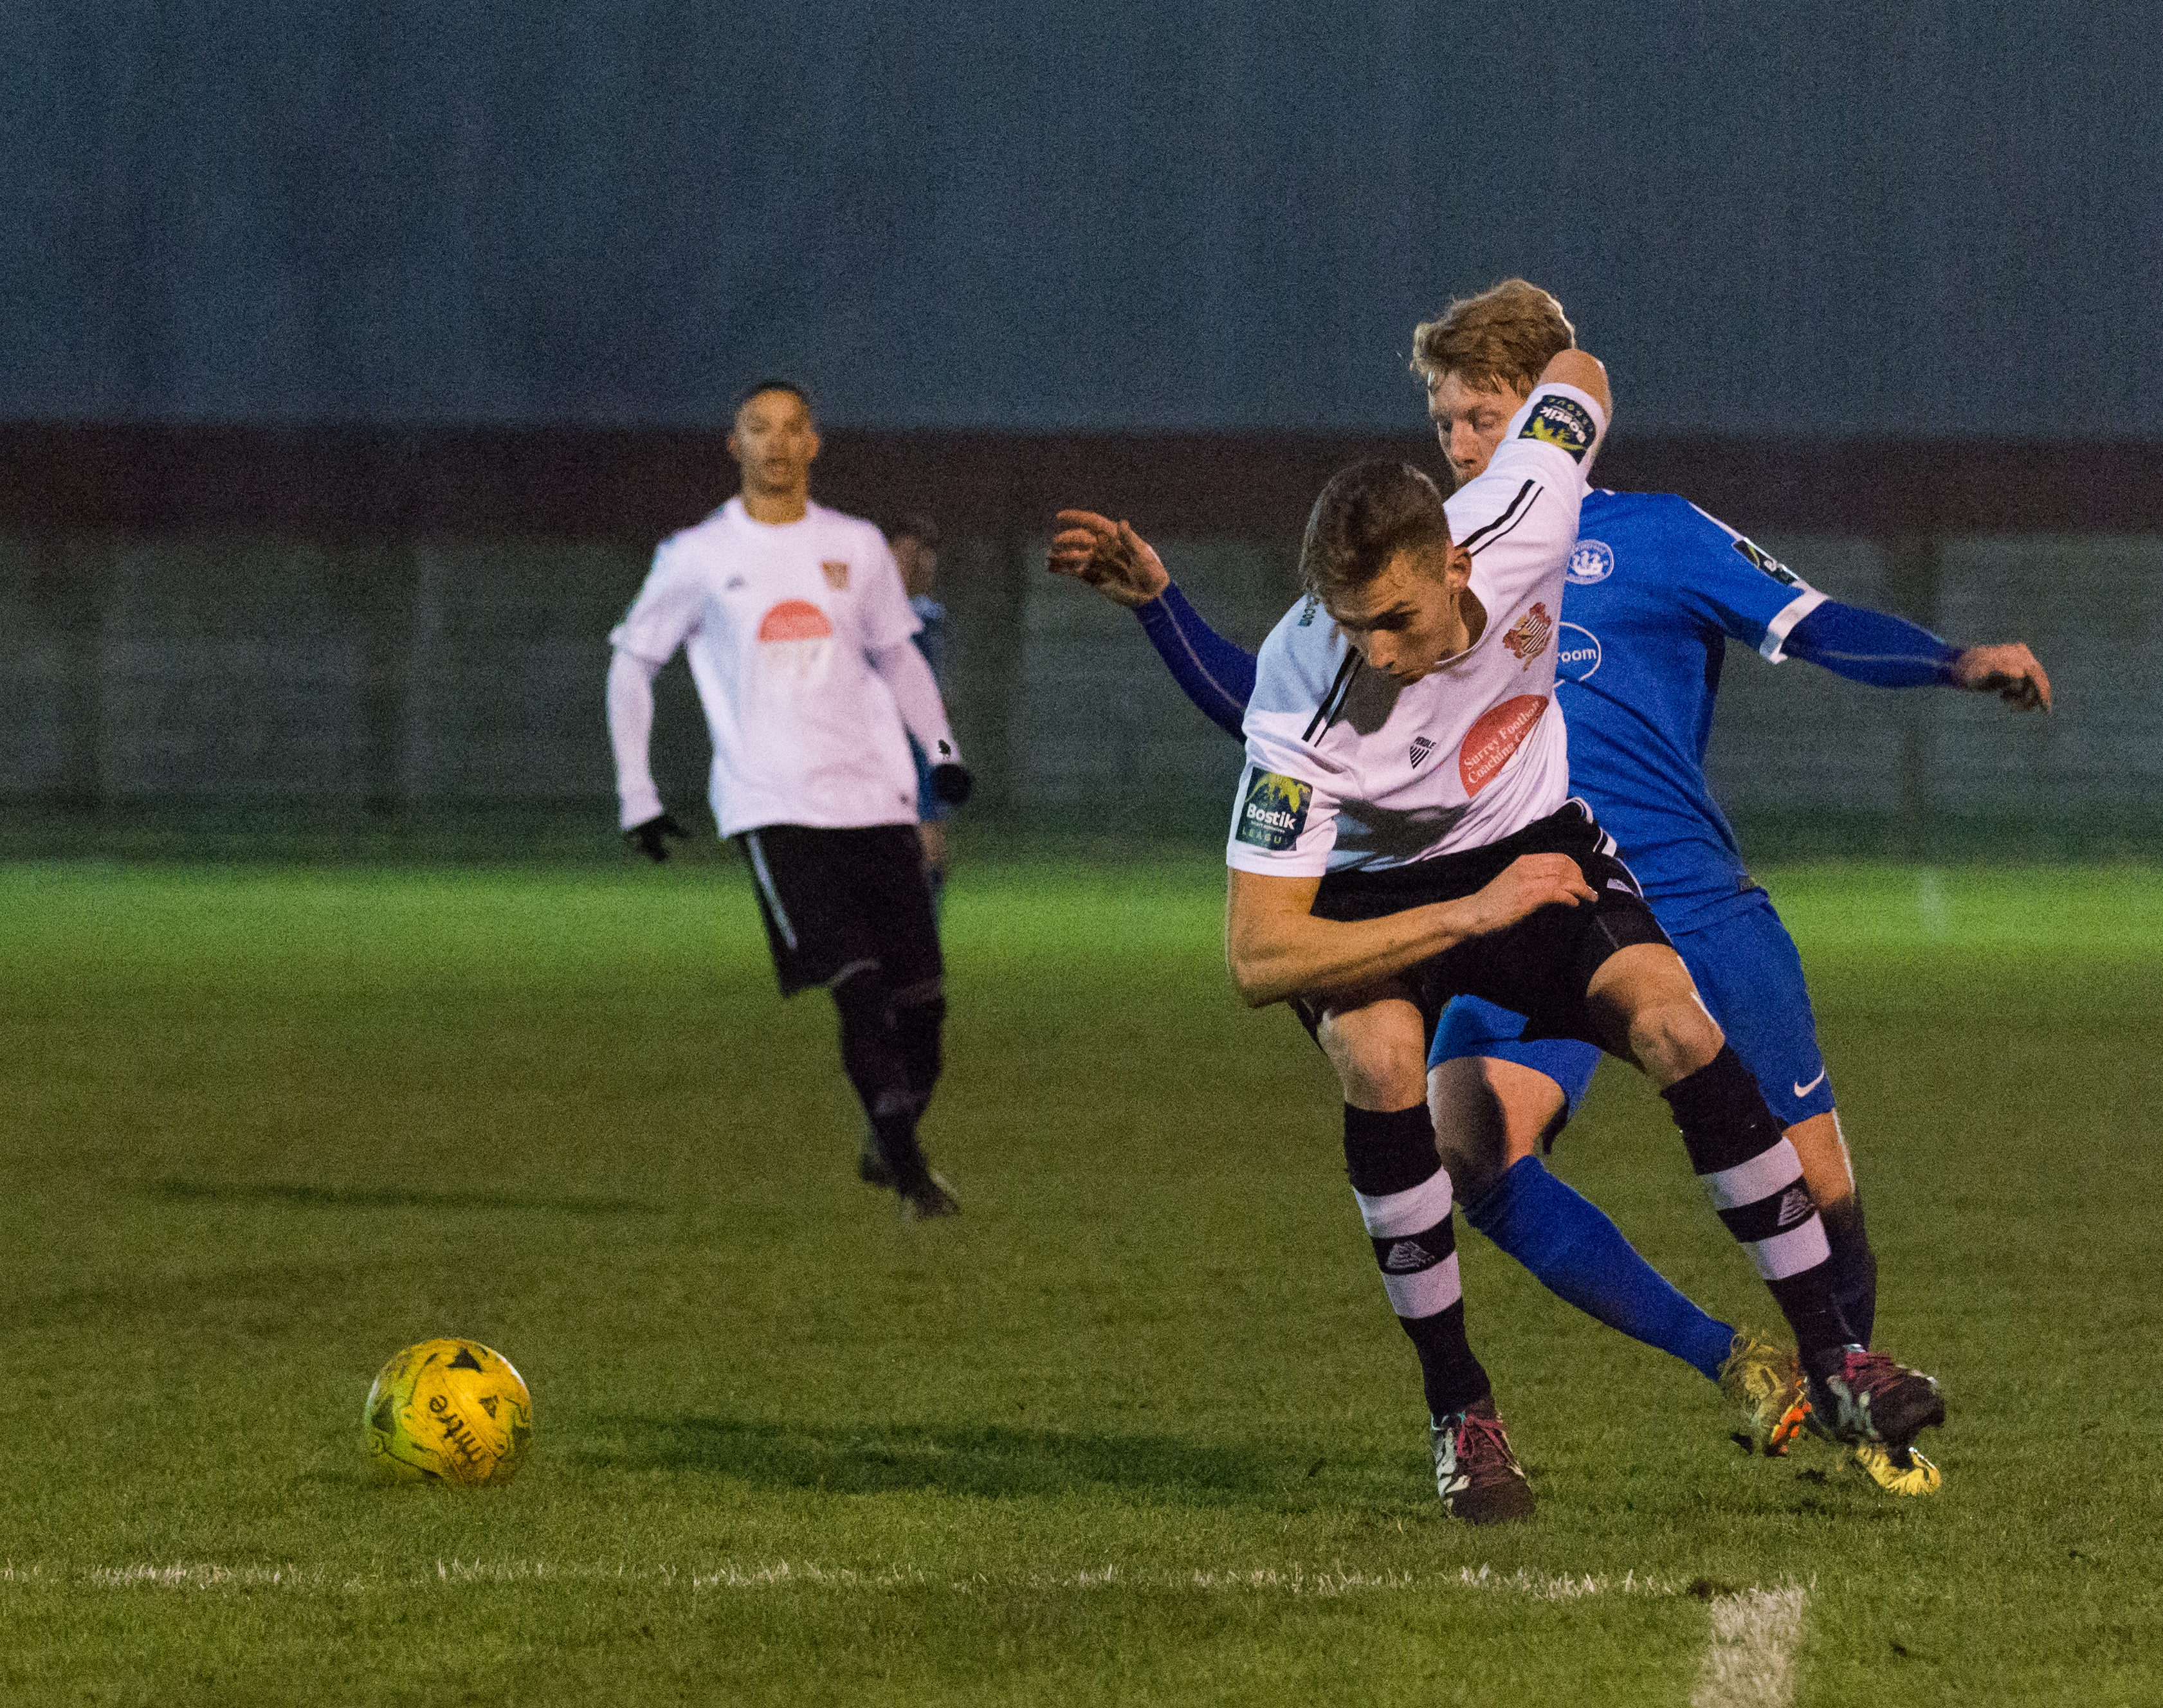 Shoreham FC vs Molesey FC 02.12.17 94